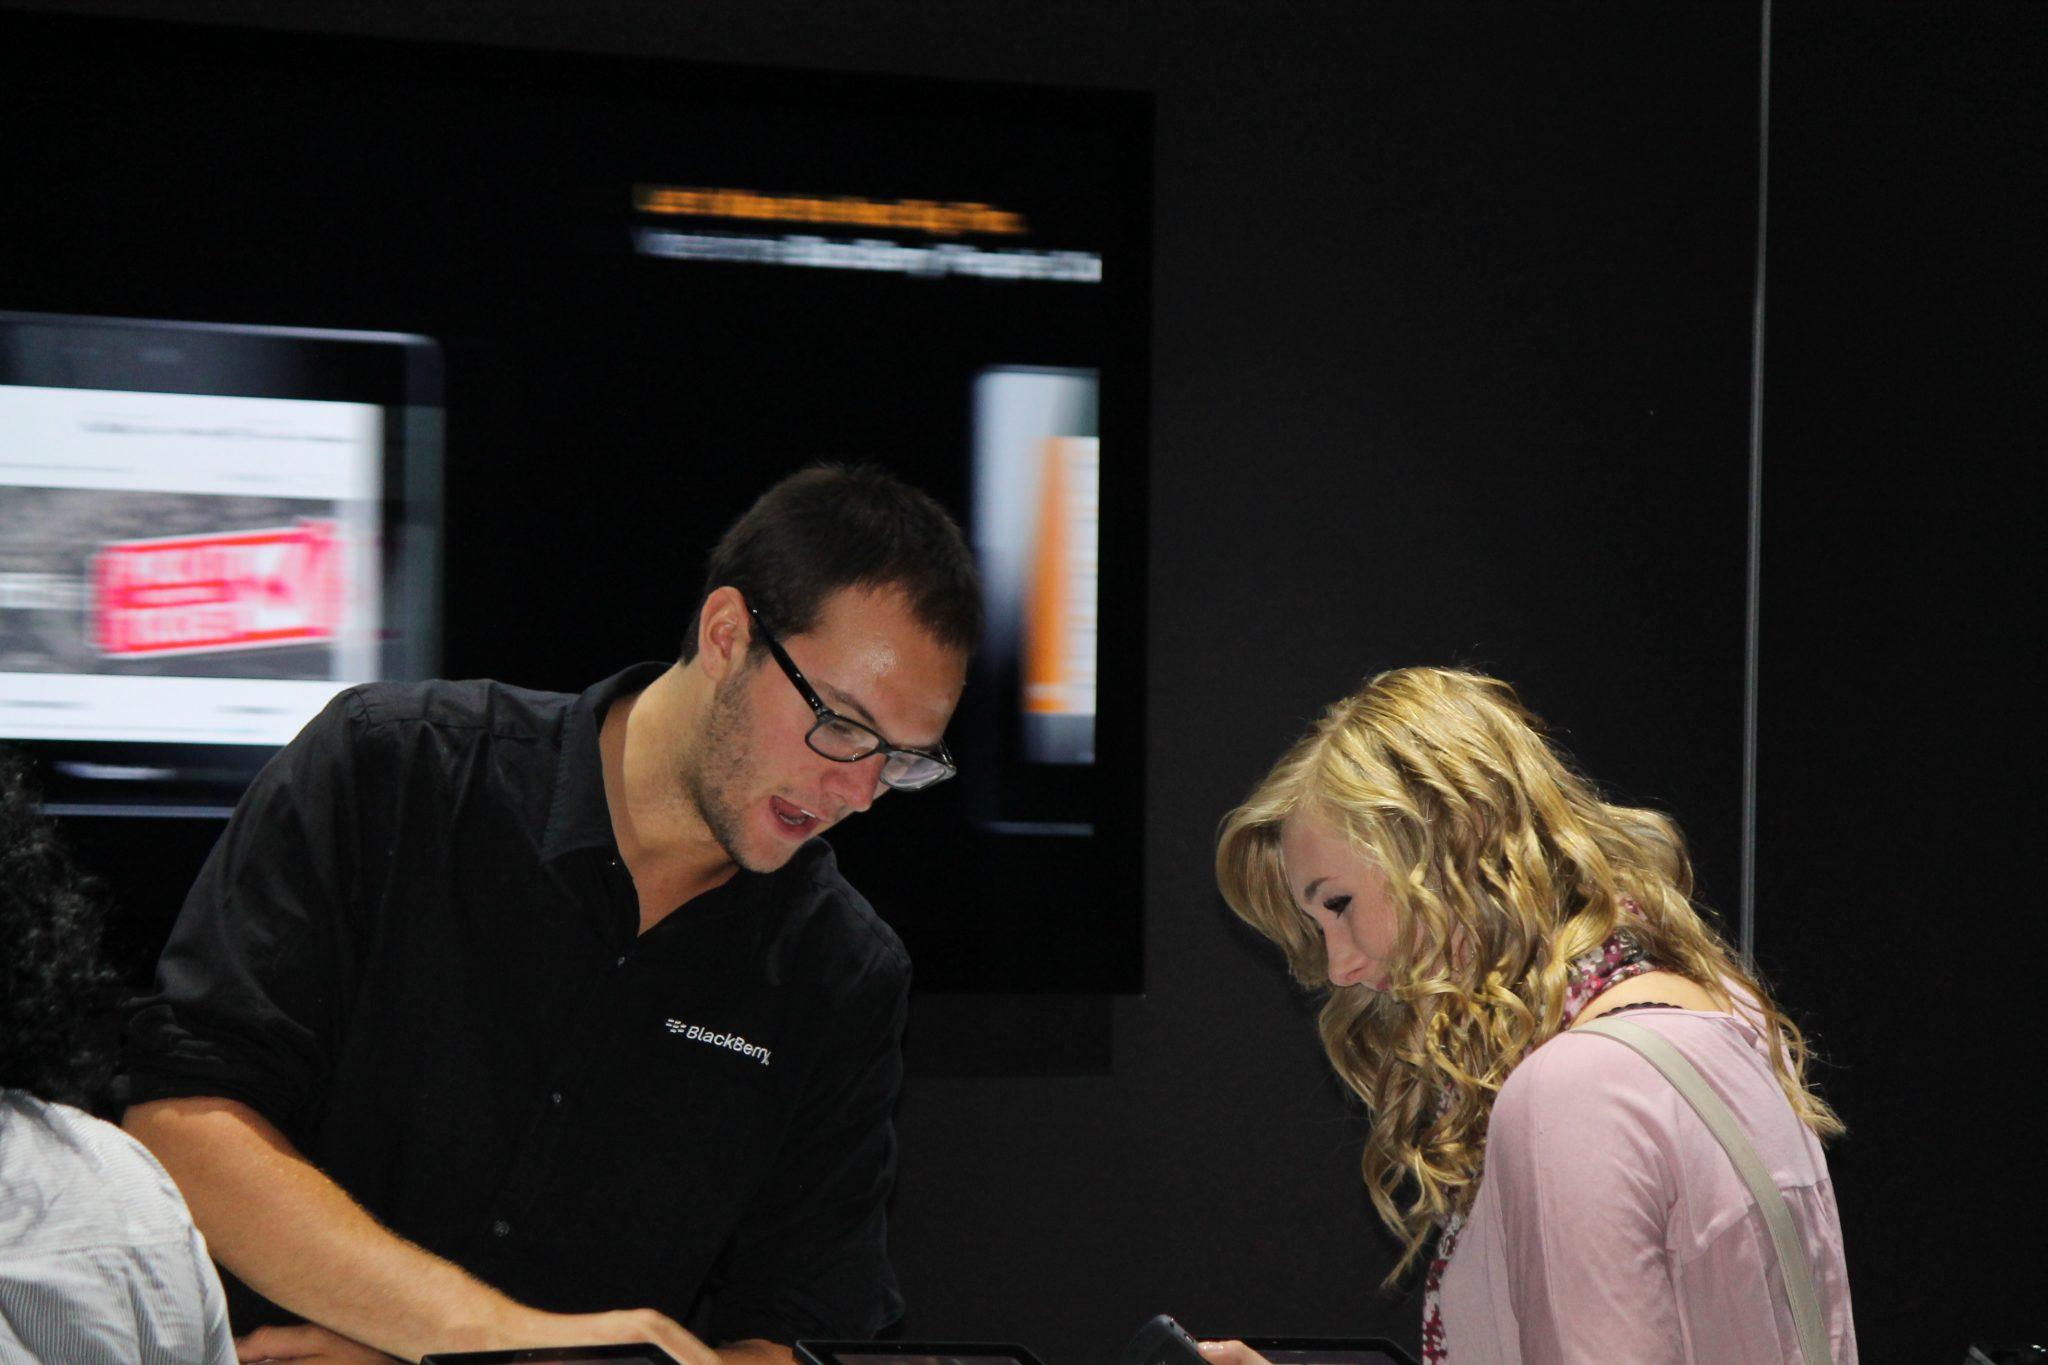 Blackberry-Experience-Center-TIFF-2012